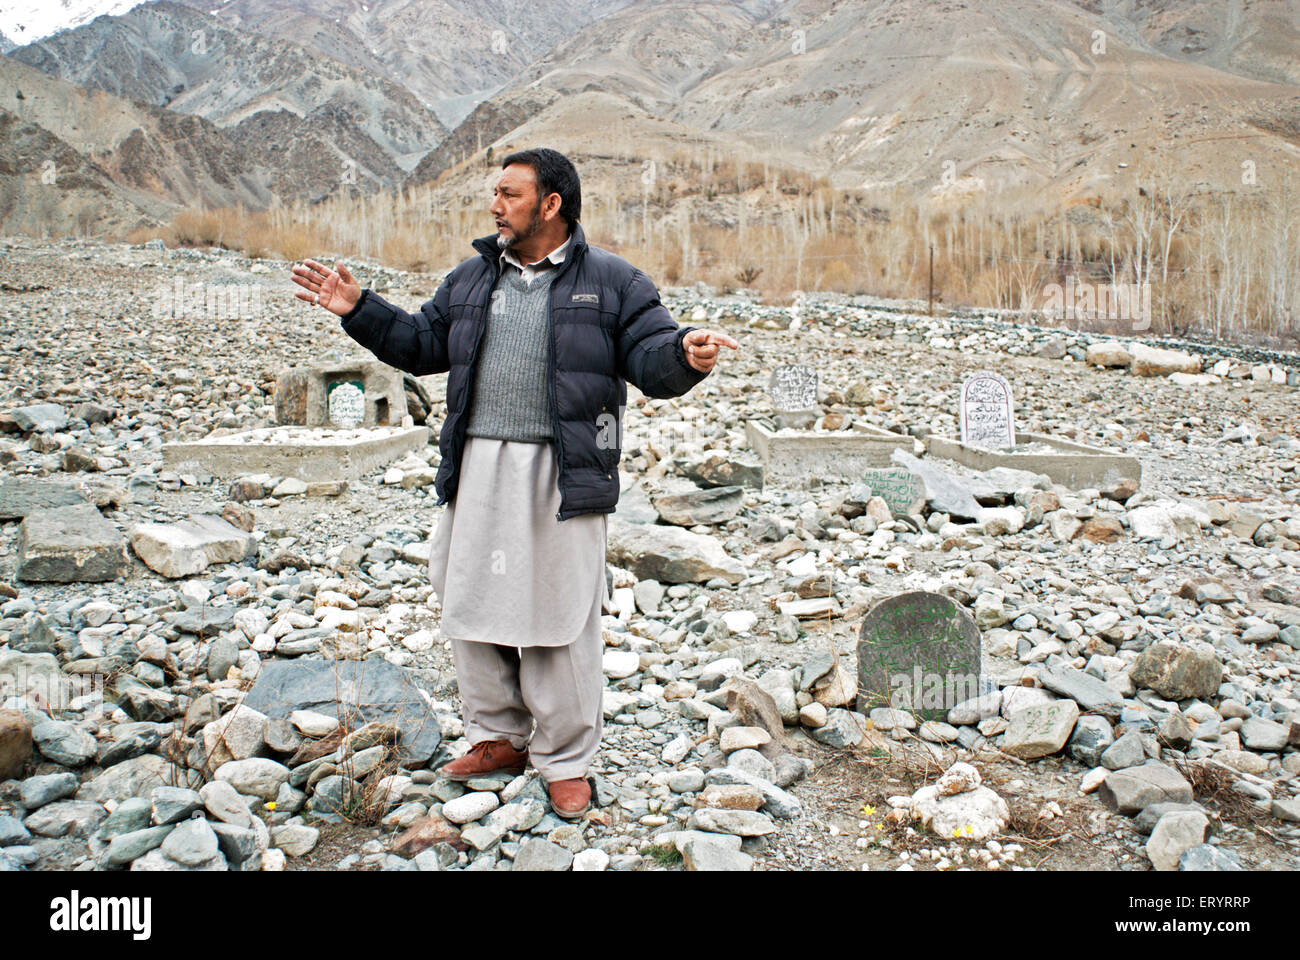 Kargil headman in martyrs cemetery ; Leh ; Ladakh ; Jammu and Kashmir ; India NO MR 10 April 2008 - Stock Image